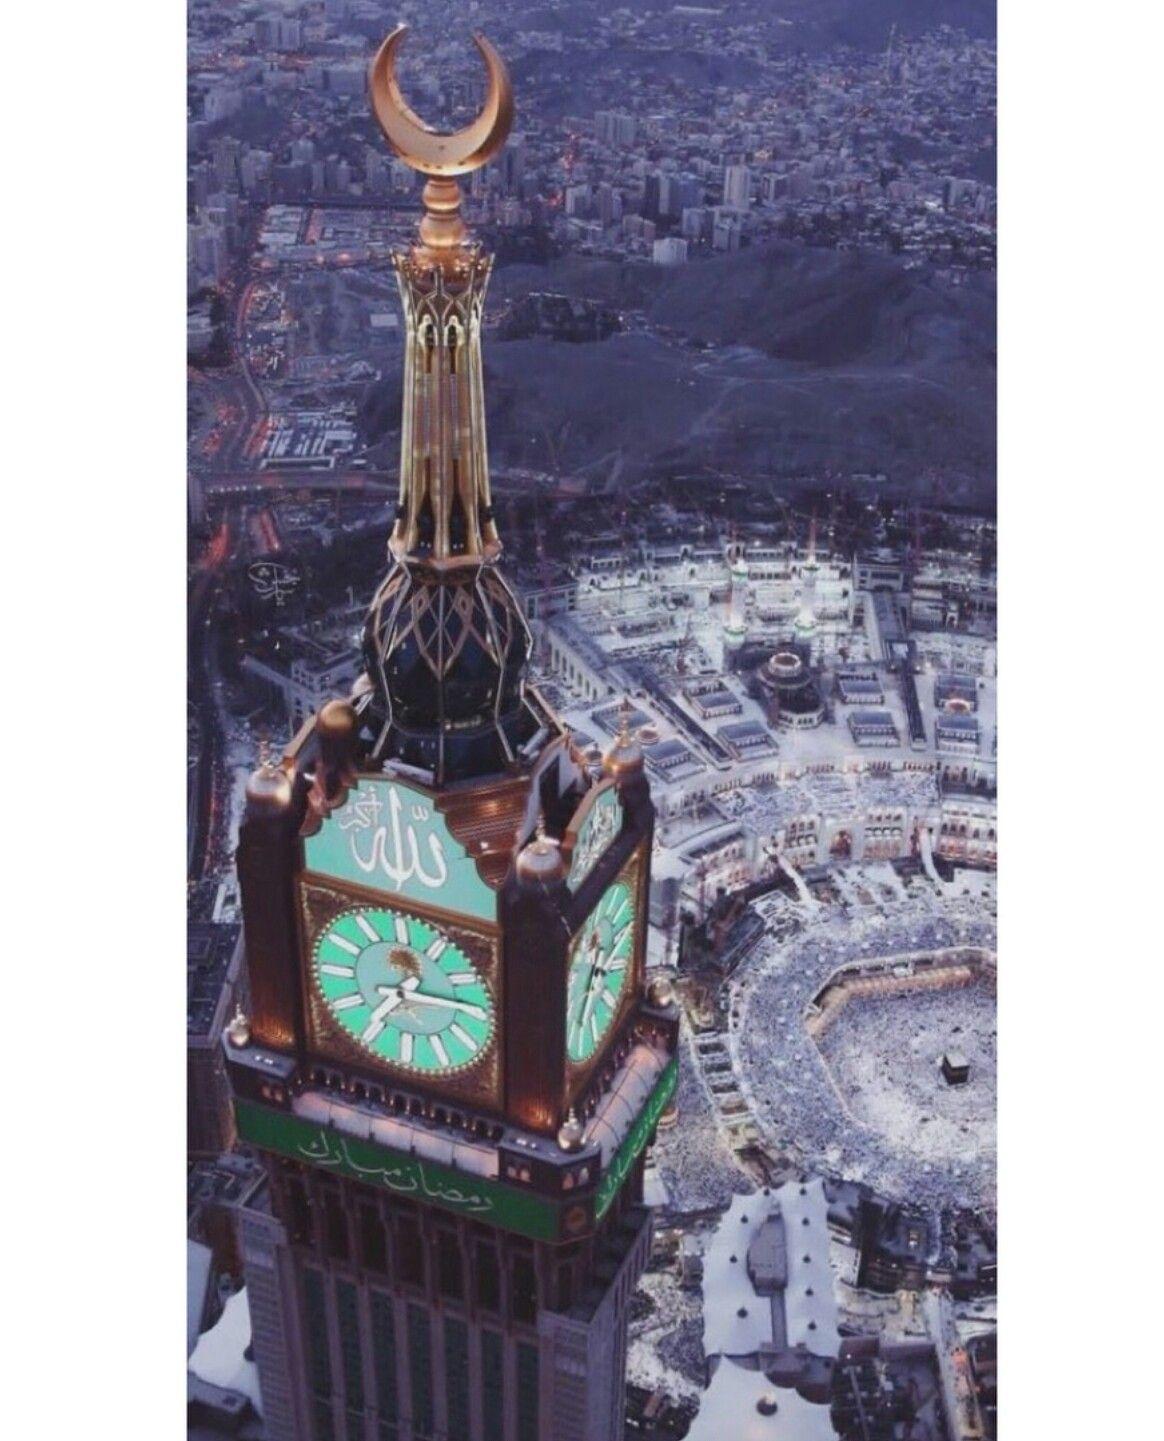 Pin By احفظ الله يحفظك On خلفيات Wallpapers Mecca Wallpaper Islamic Wallpaper Mecca Kaaba